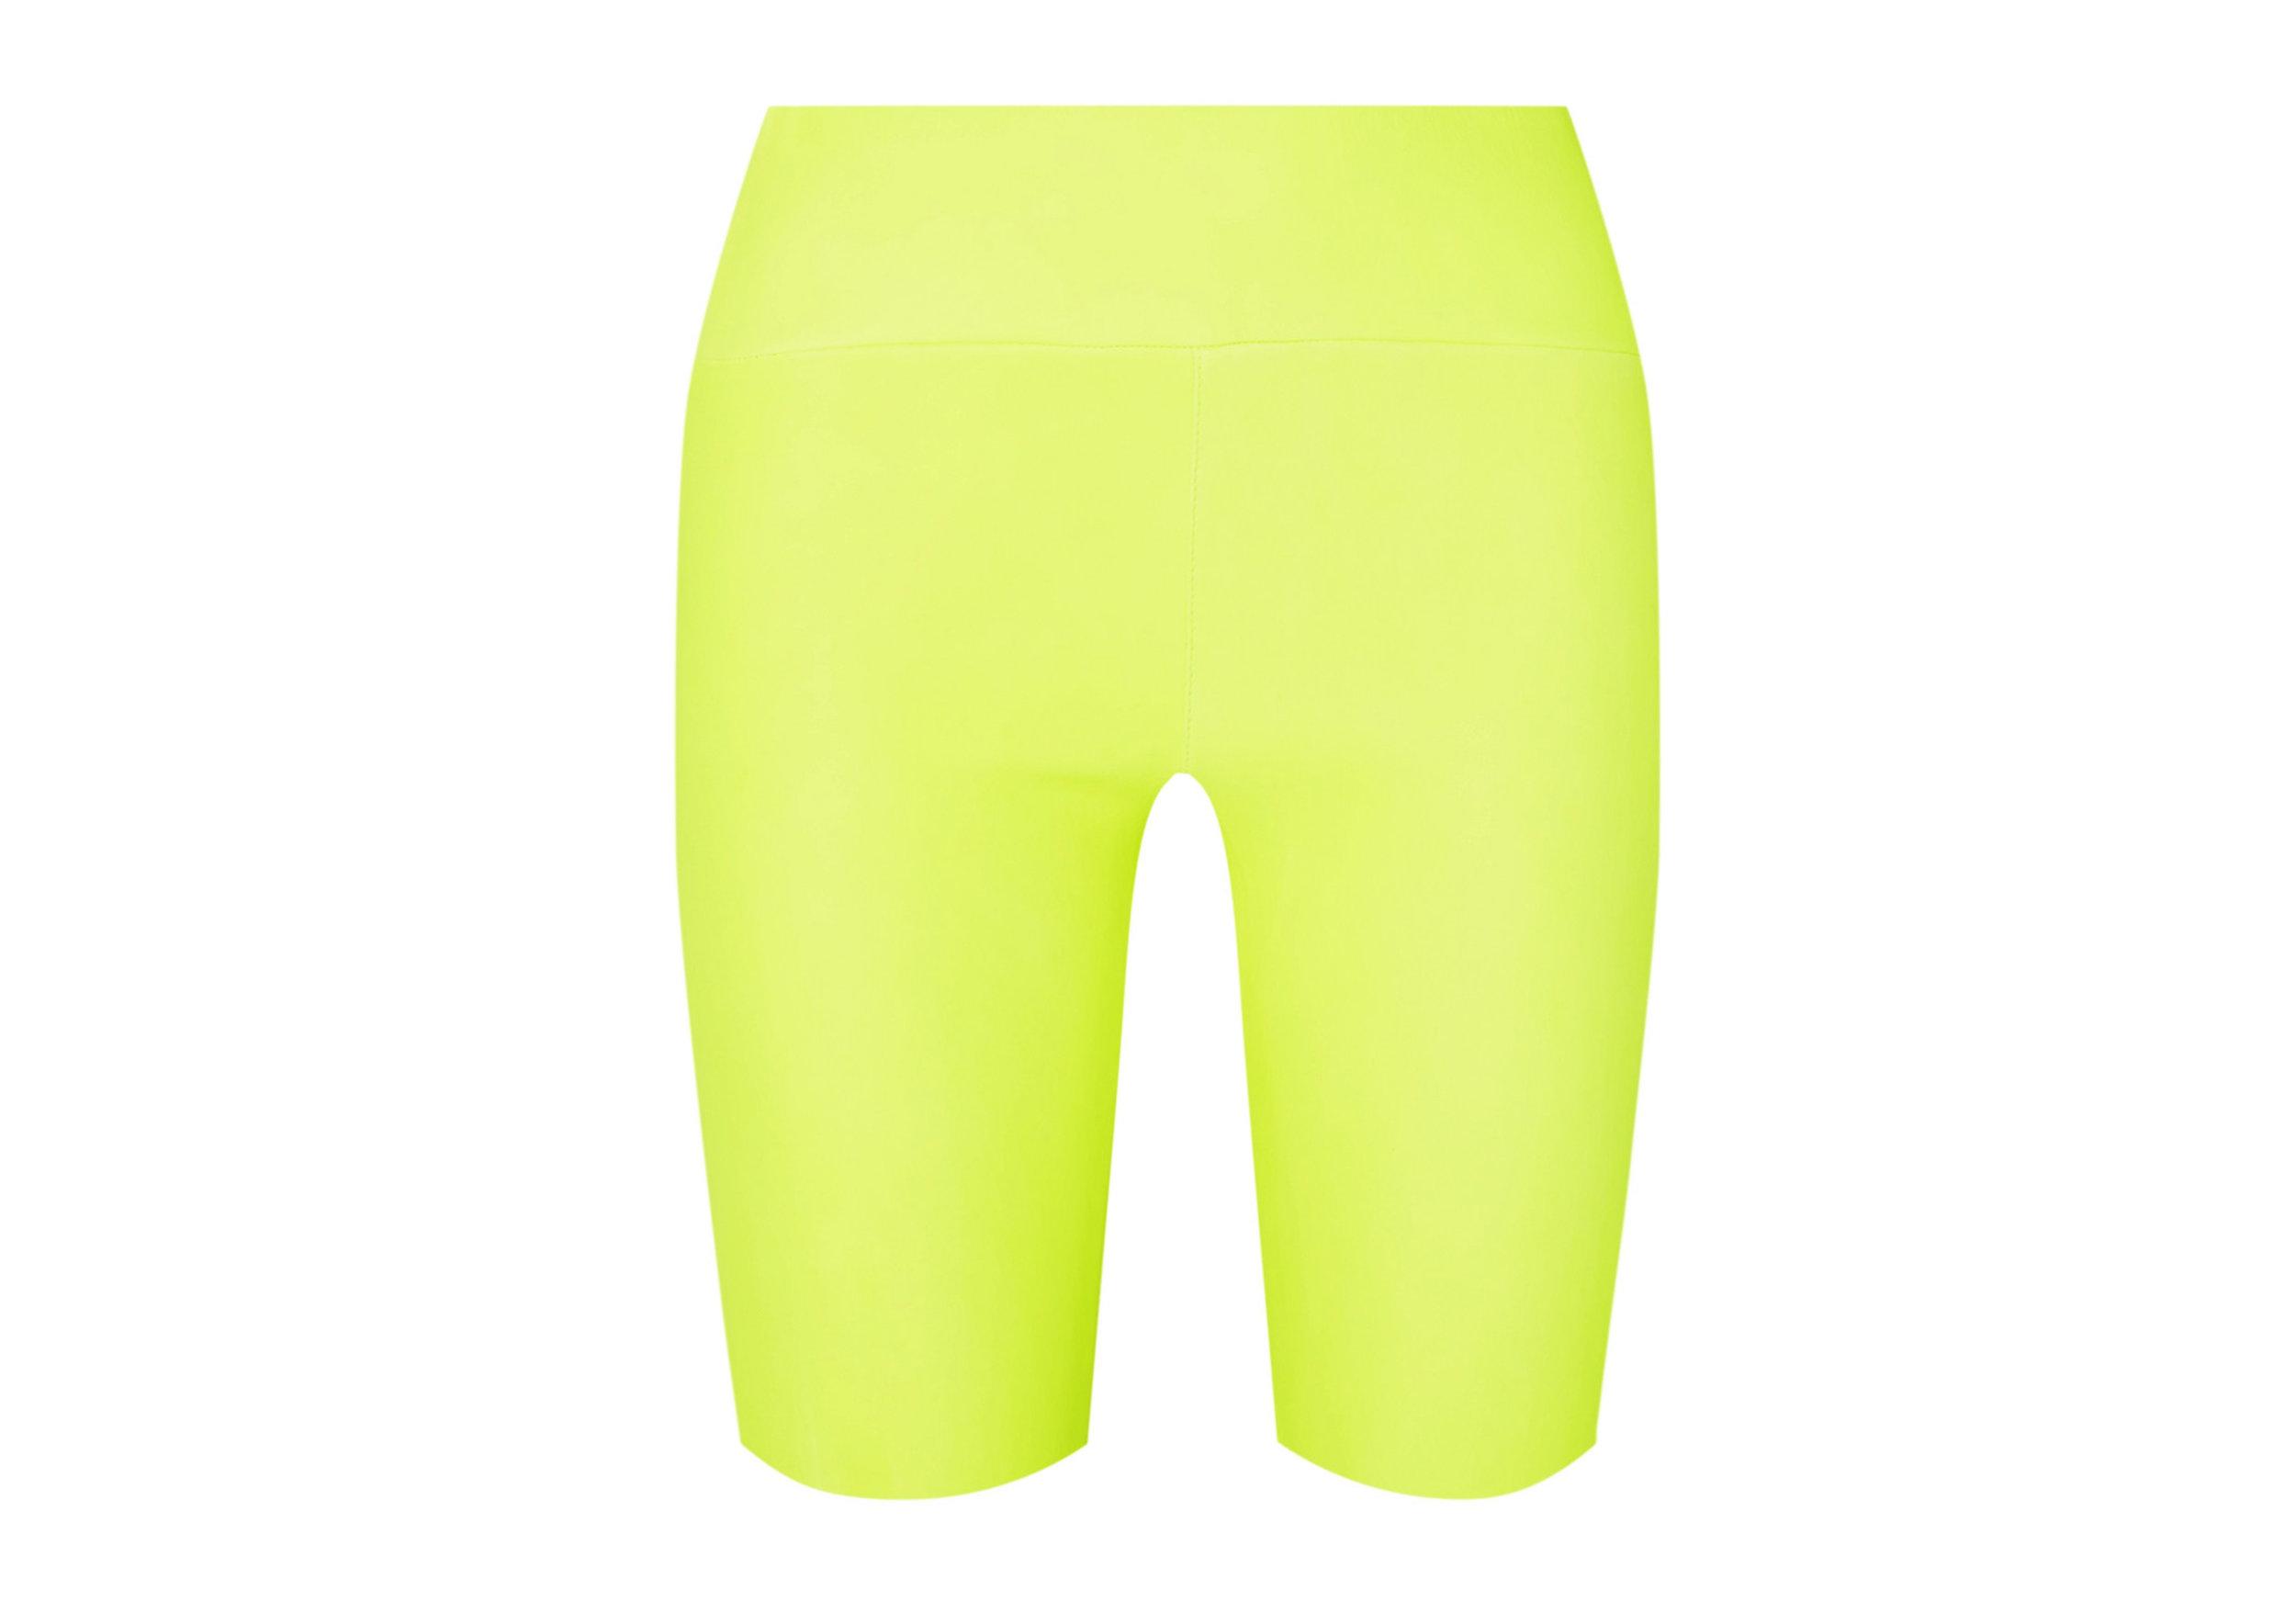 SPRWMN - Neon Leather Shorts, SGD 1,121